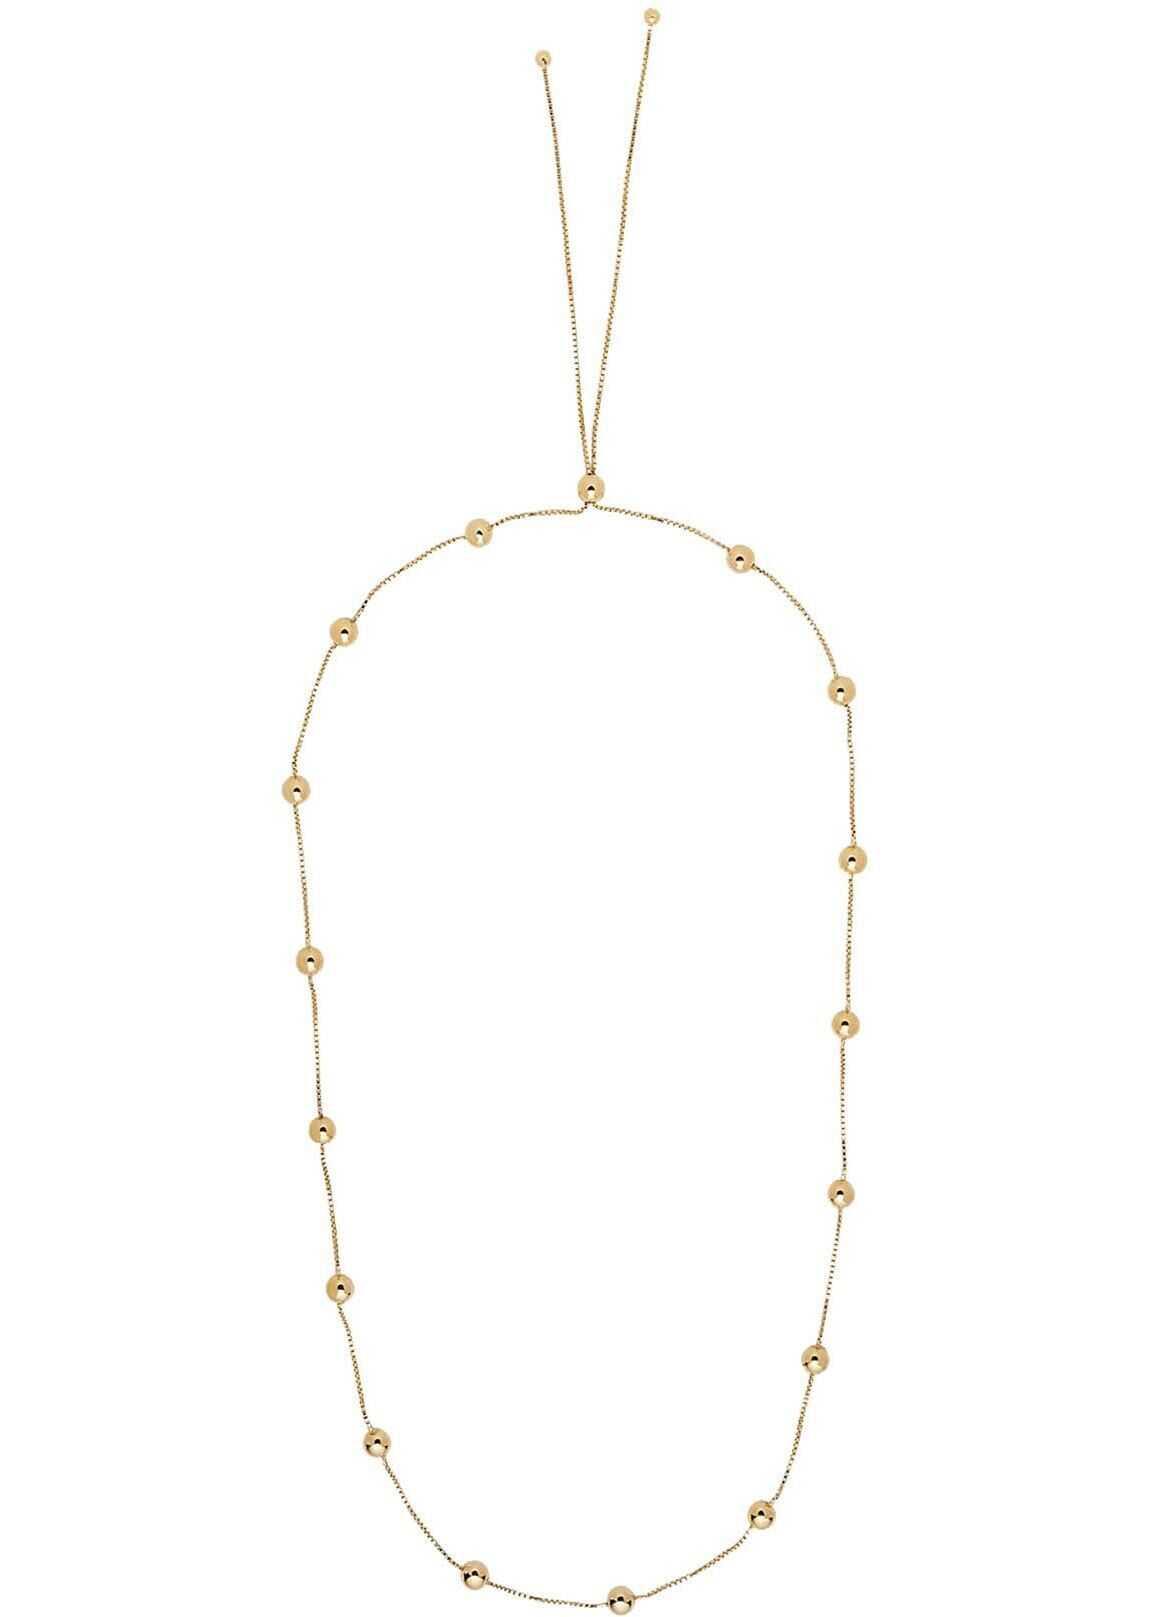 Bottega Veneta Spheres Necklace In Gold Color Yellow